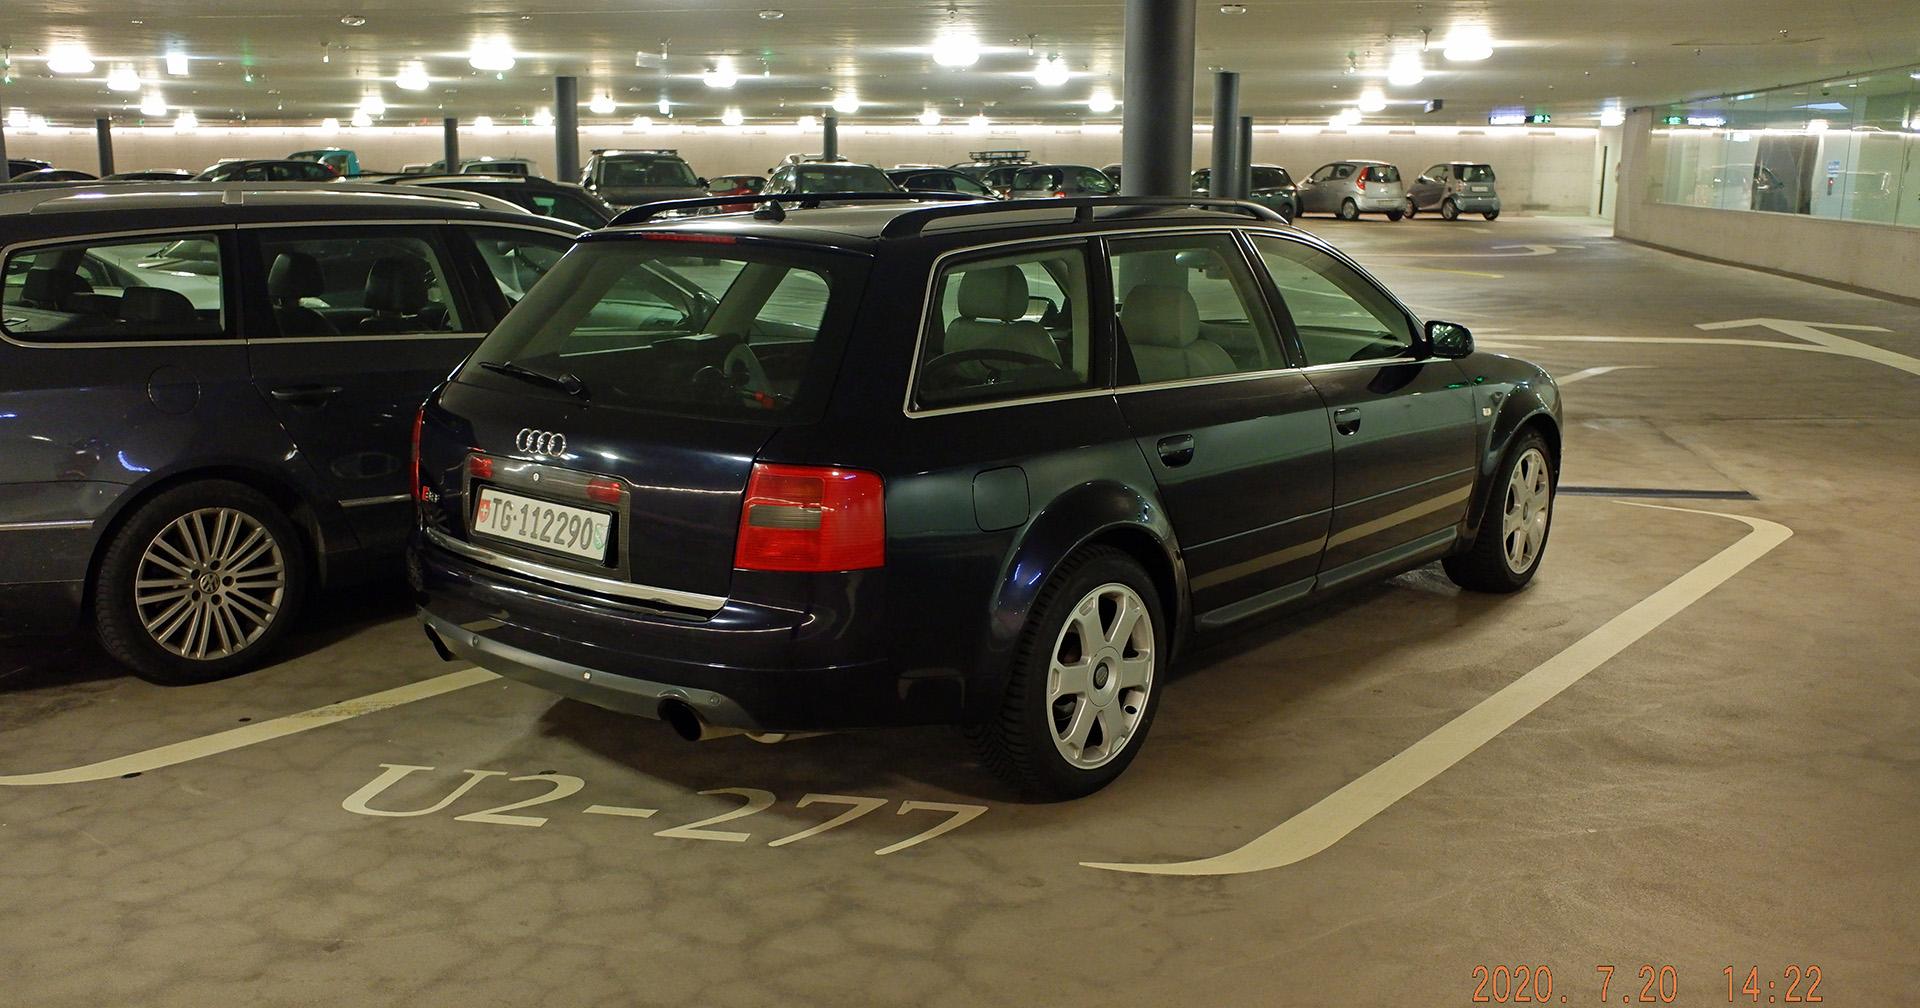 Audi-S6-July-2020.jpg